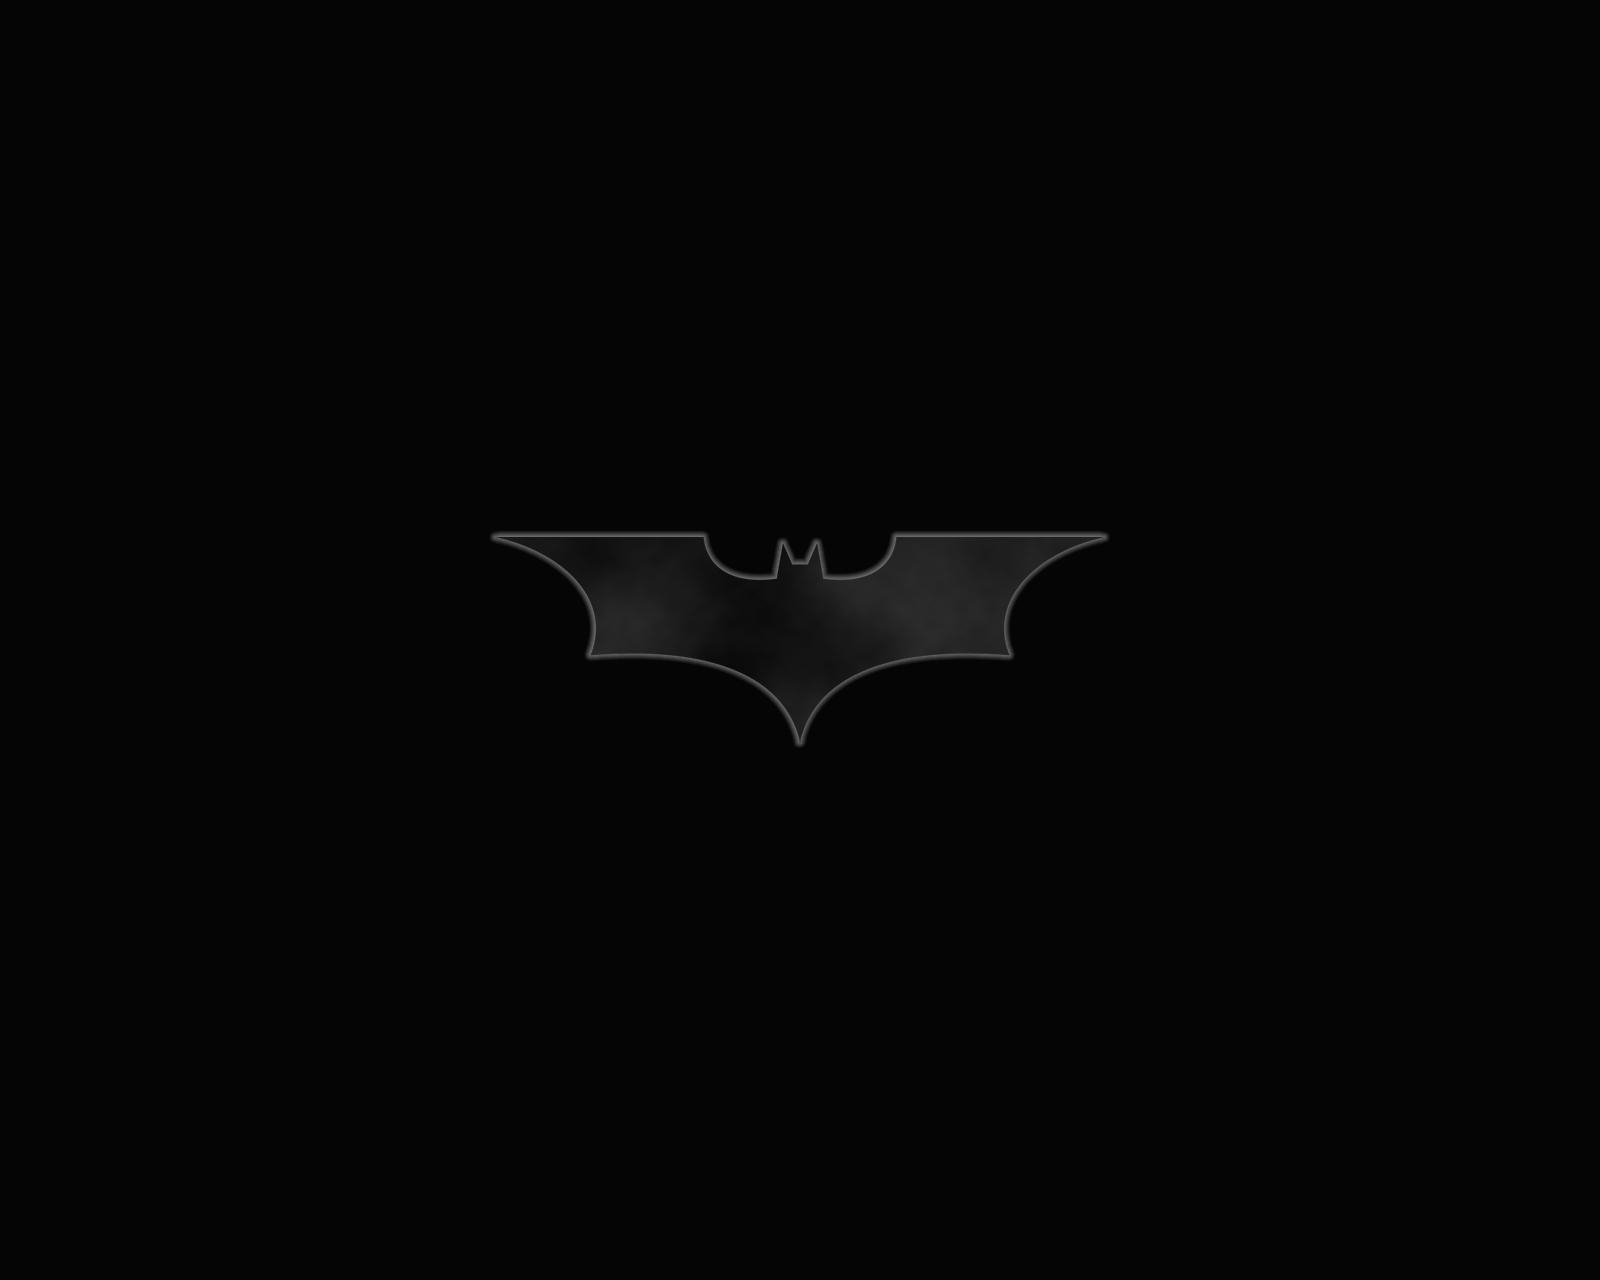 Batman Wallpaper For Retina IPhone, Retina IPad And Nexus